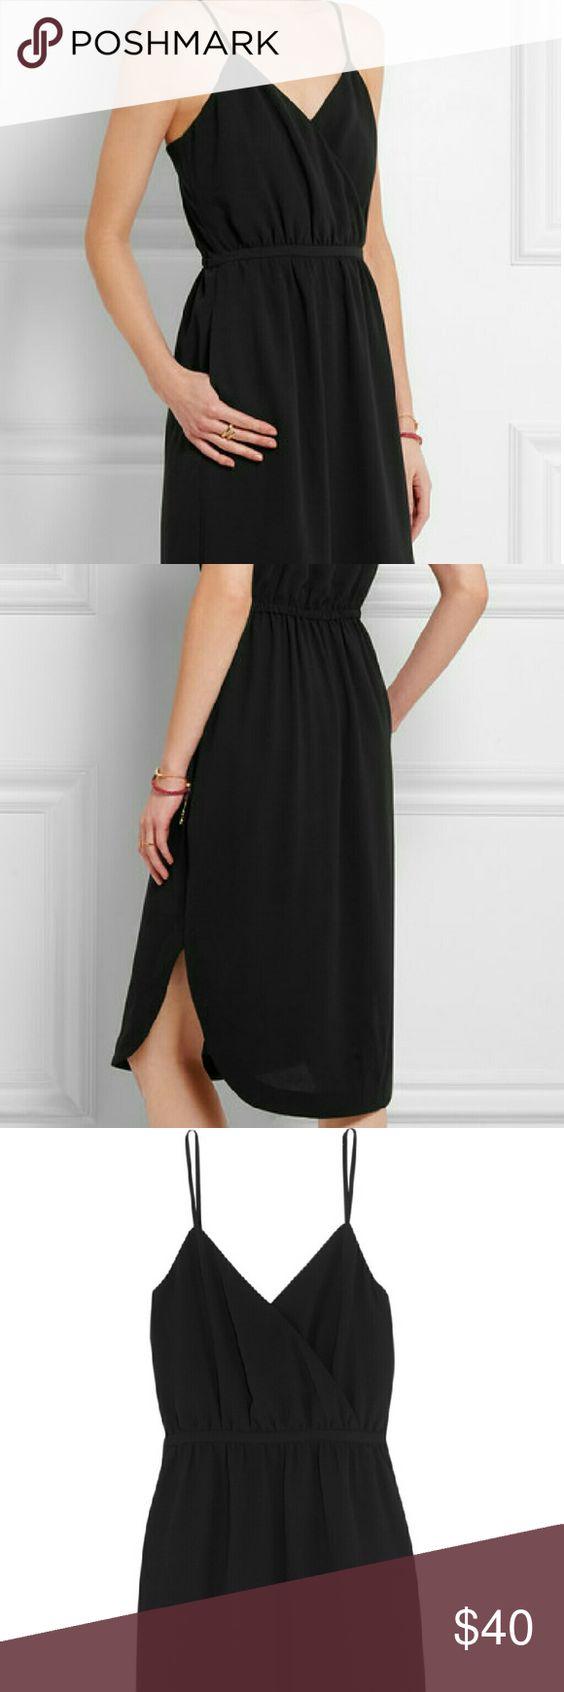 Madewell dress Polyester to the knee dress Madewell Dresses Midi